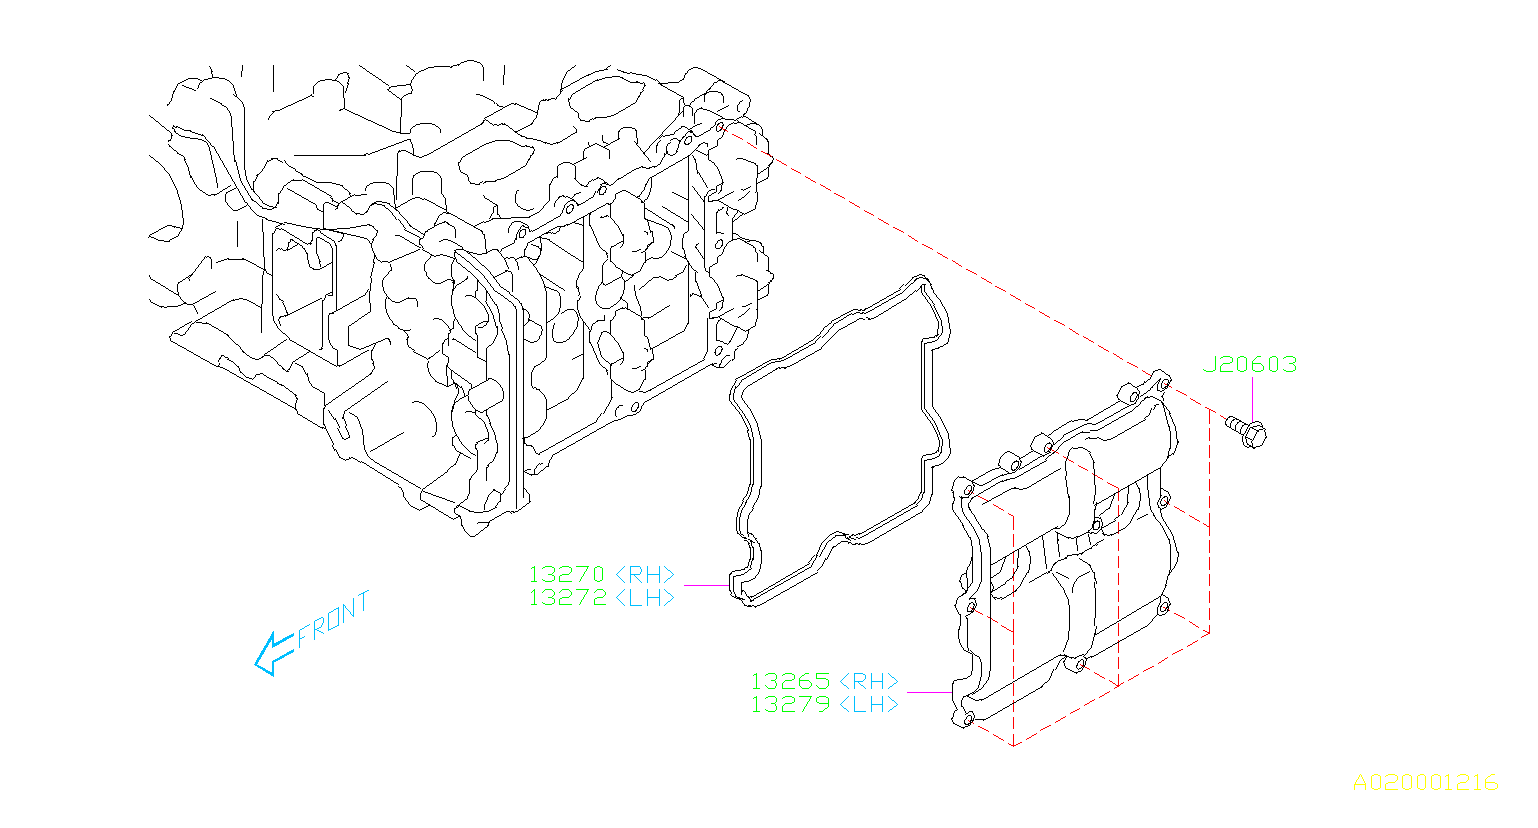 Subaru Forester Engine Valve Cover Gasket (Right). Gasket